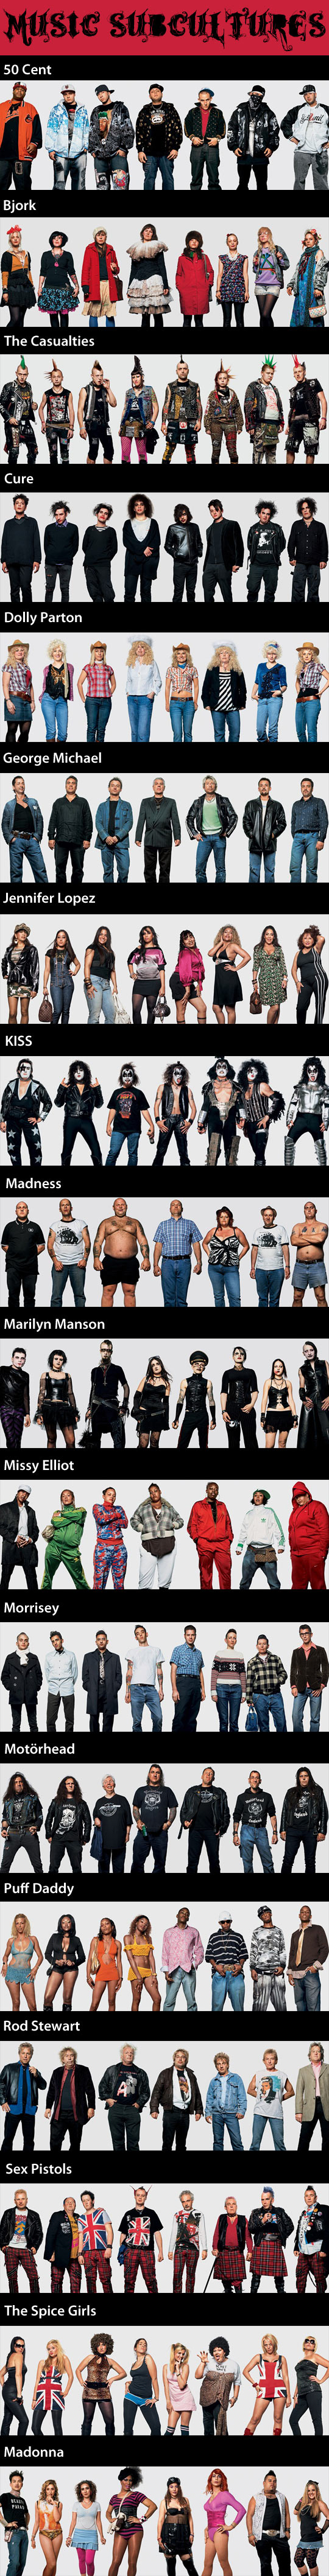 cool-music-subcultures-Madonna-Bjork